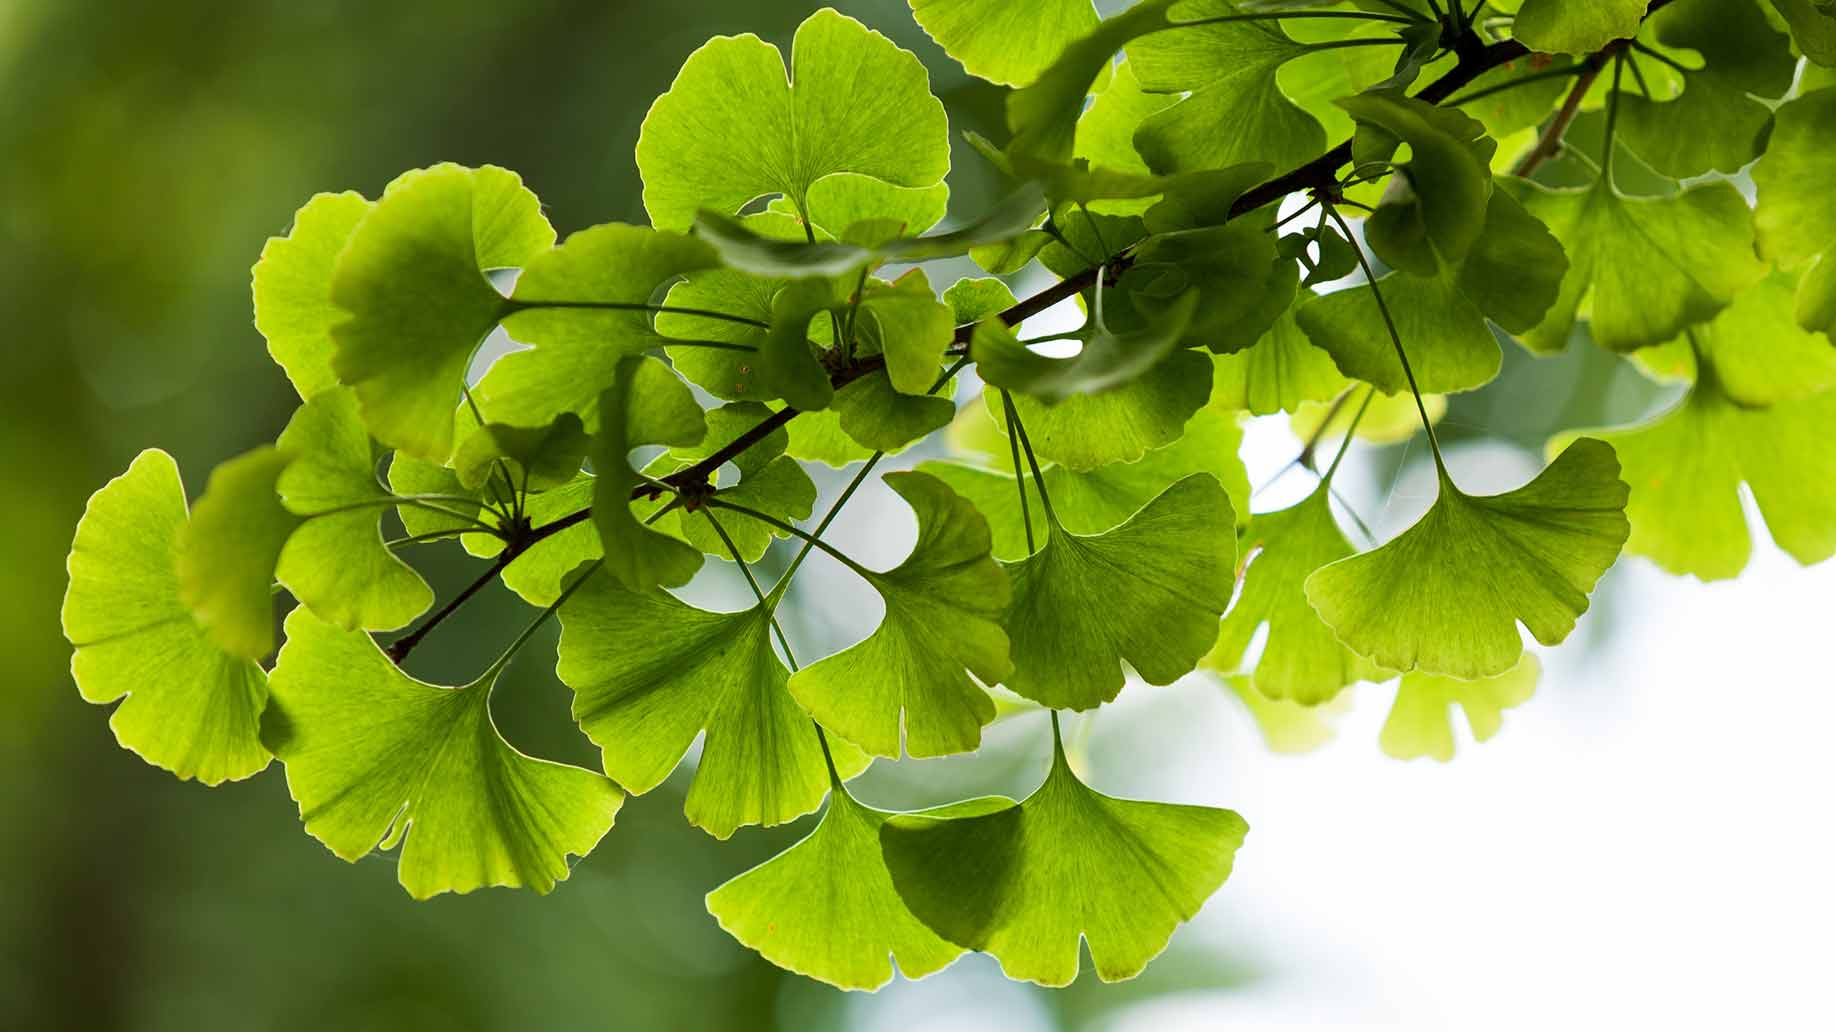 ginkgo biloba herb hormone imbalance menopause menses periods pms natural remedies